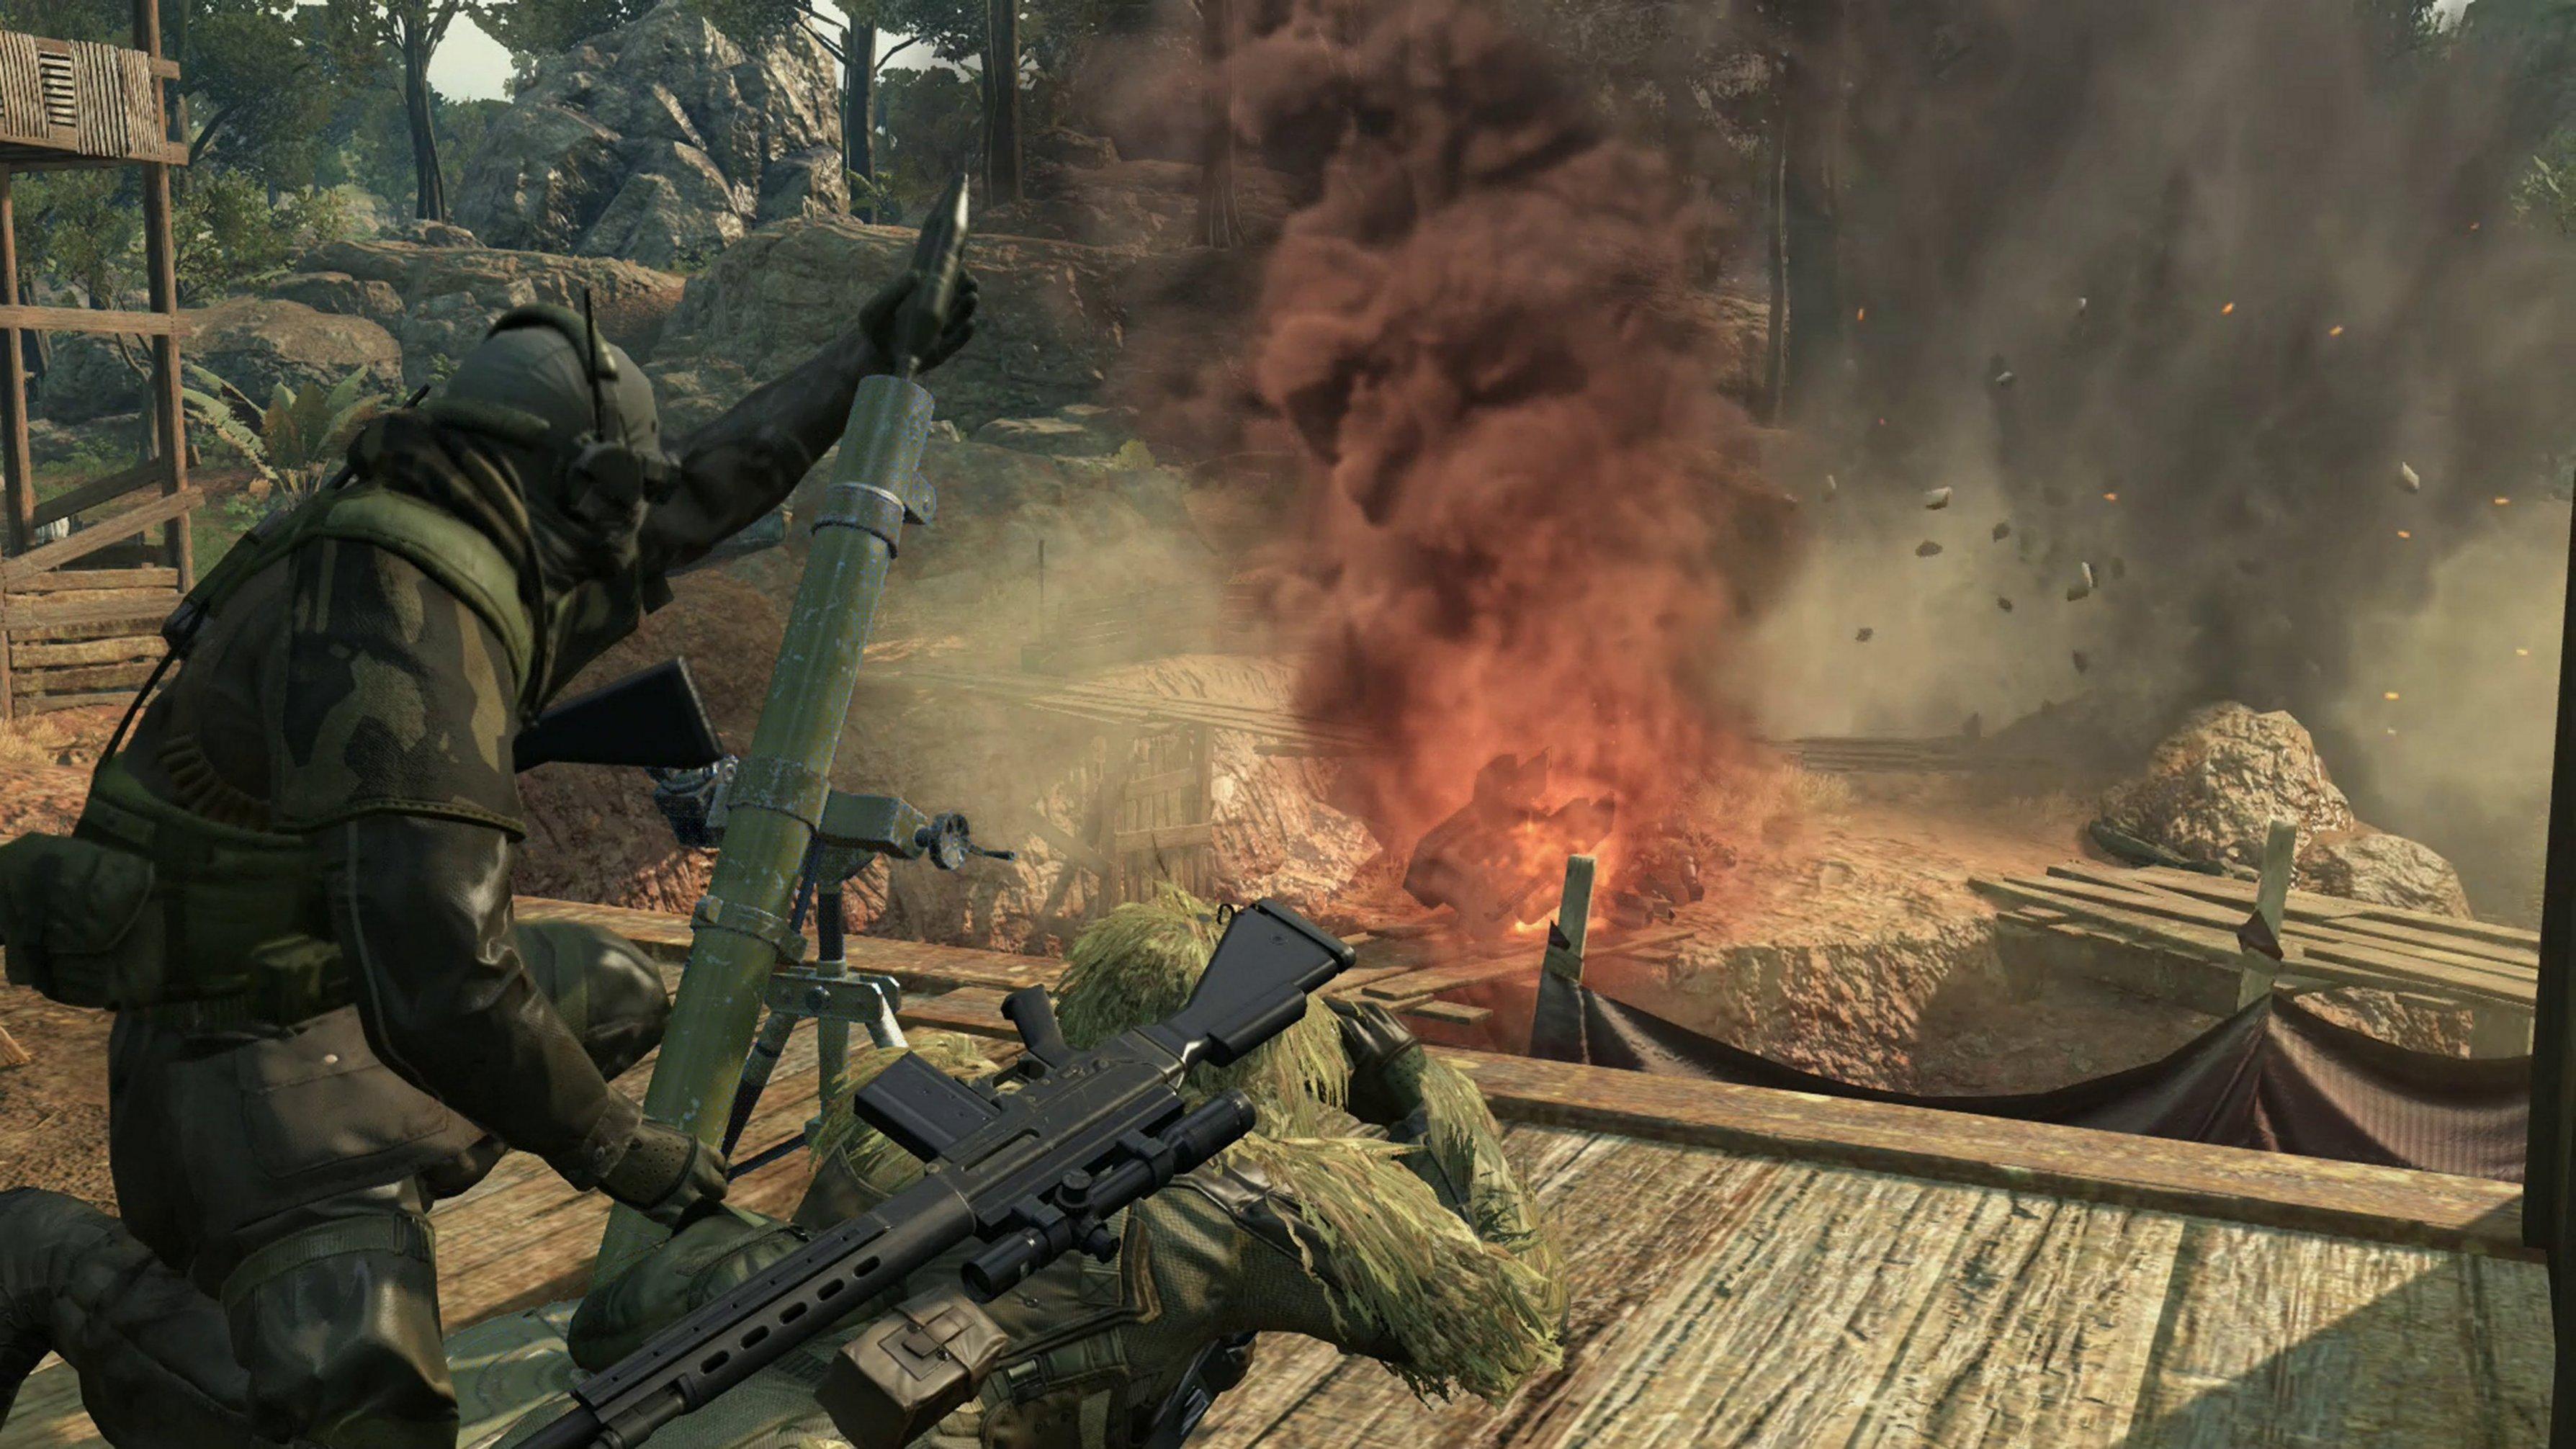 Metal Gear Solid V: The Phantom Pain: METAL GEAR ONLINE